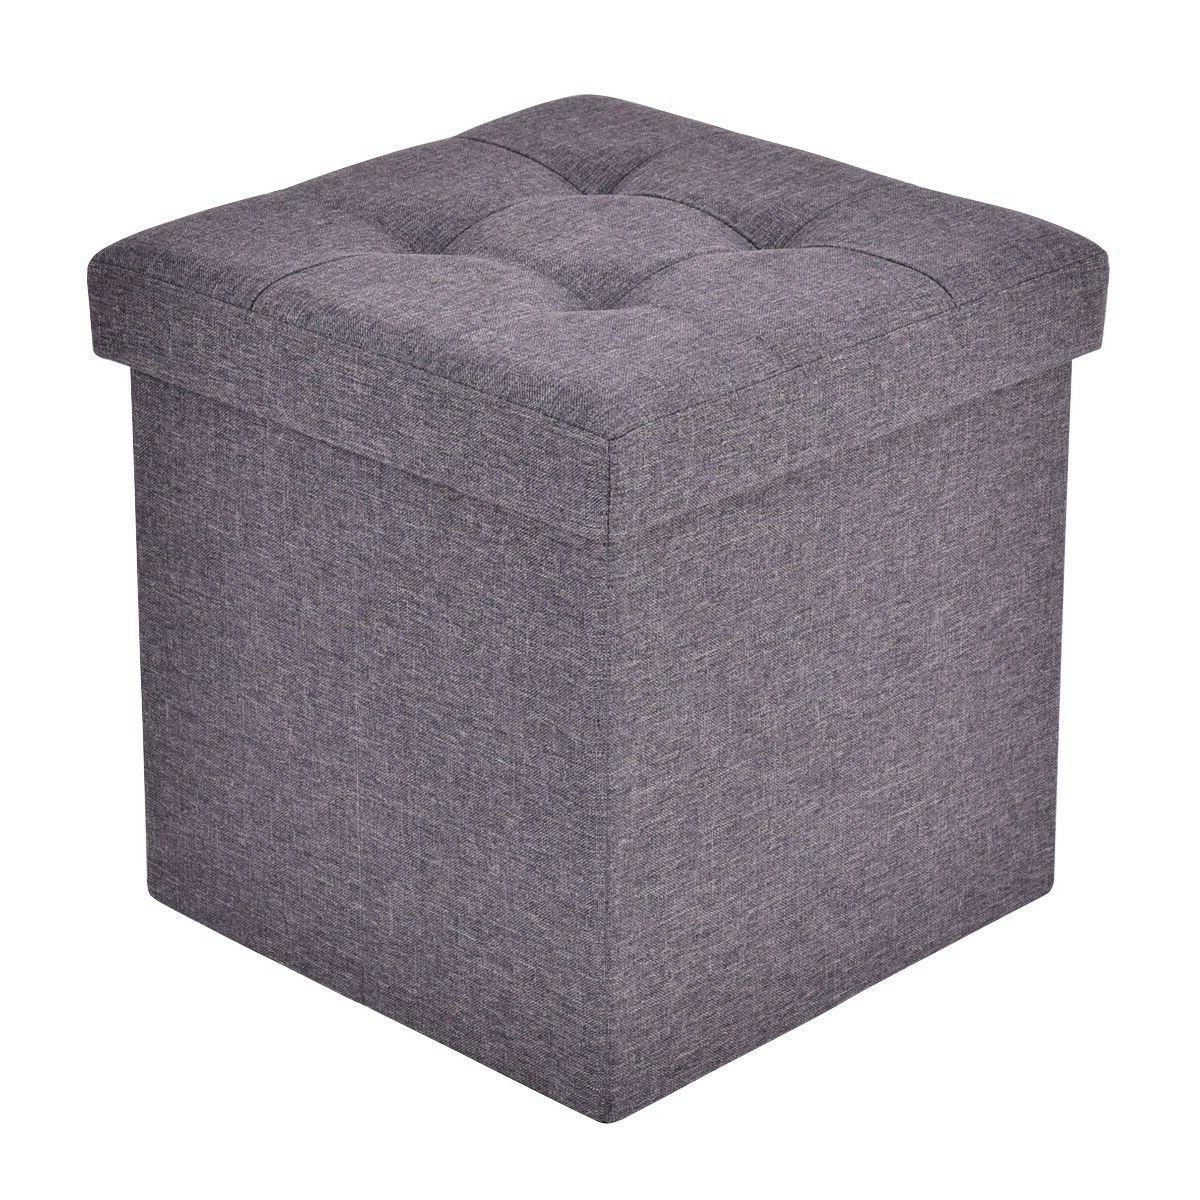 Giantex Folding Storage Cube Ottoman Seat Stool Box Footrest